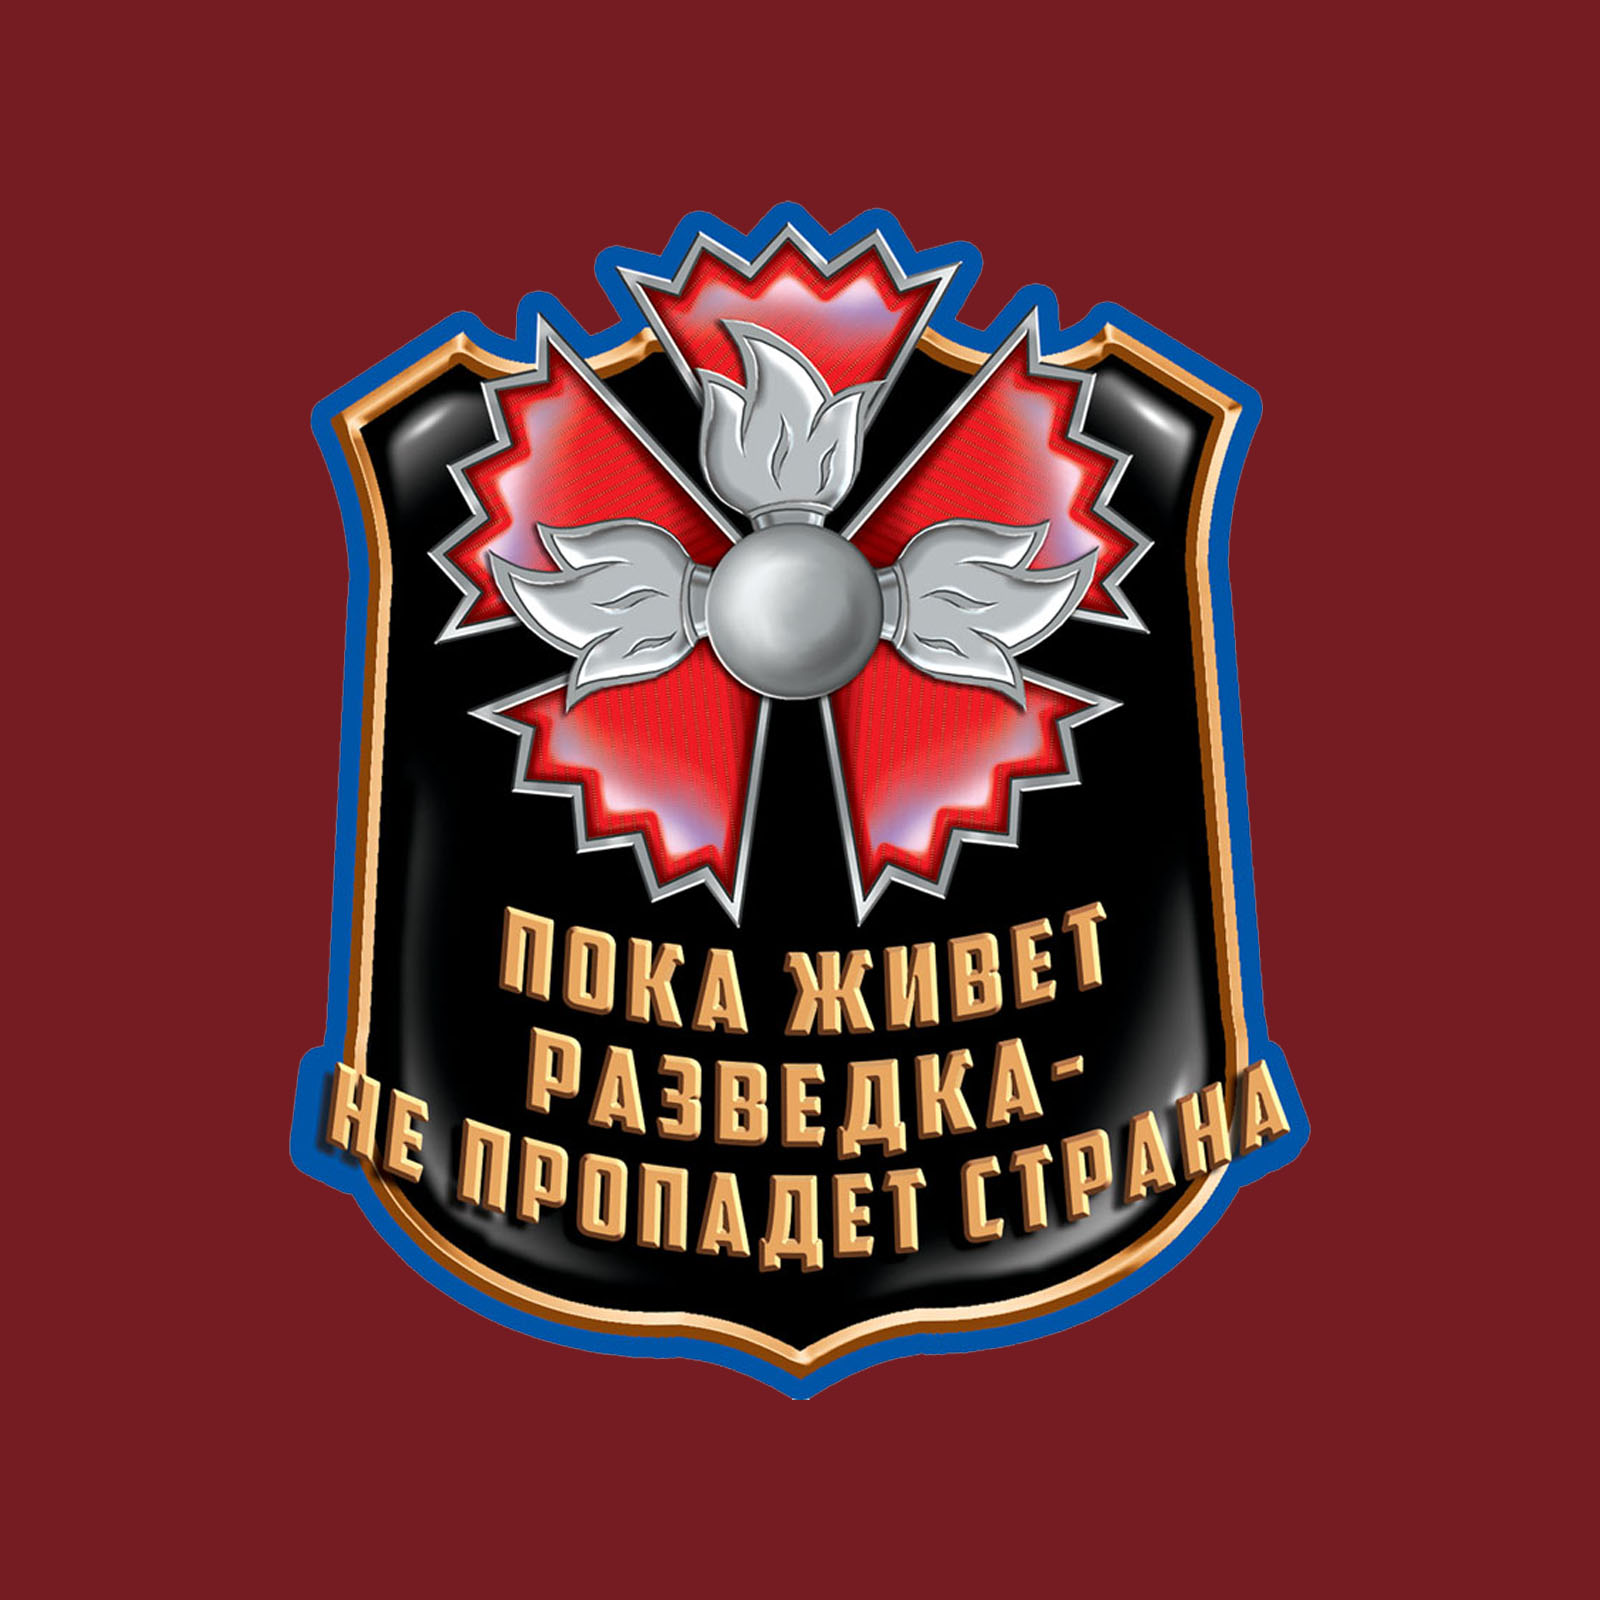 Стильная краповая футболка Военная разведка